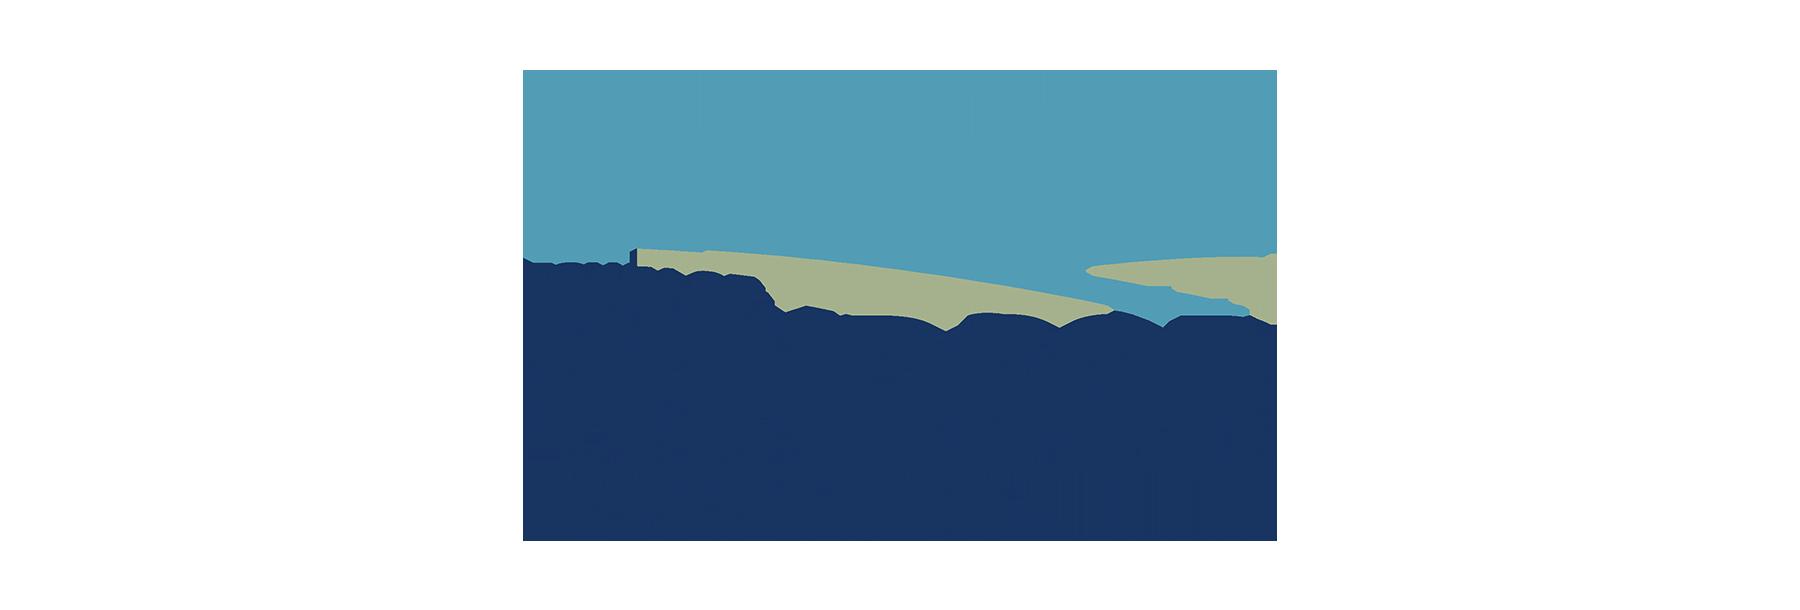 town of windsor new logo